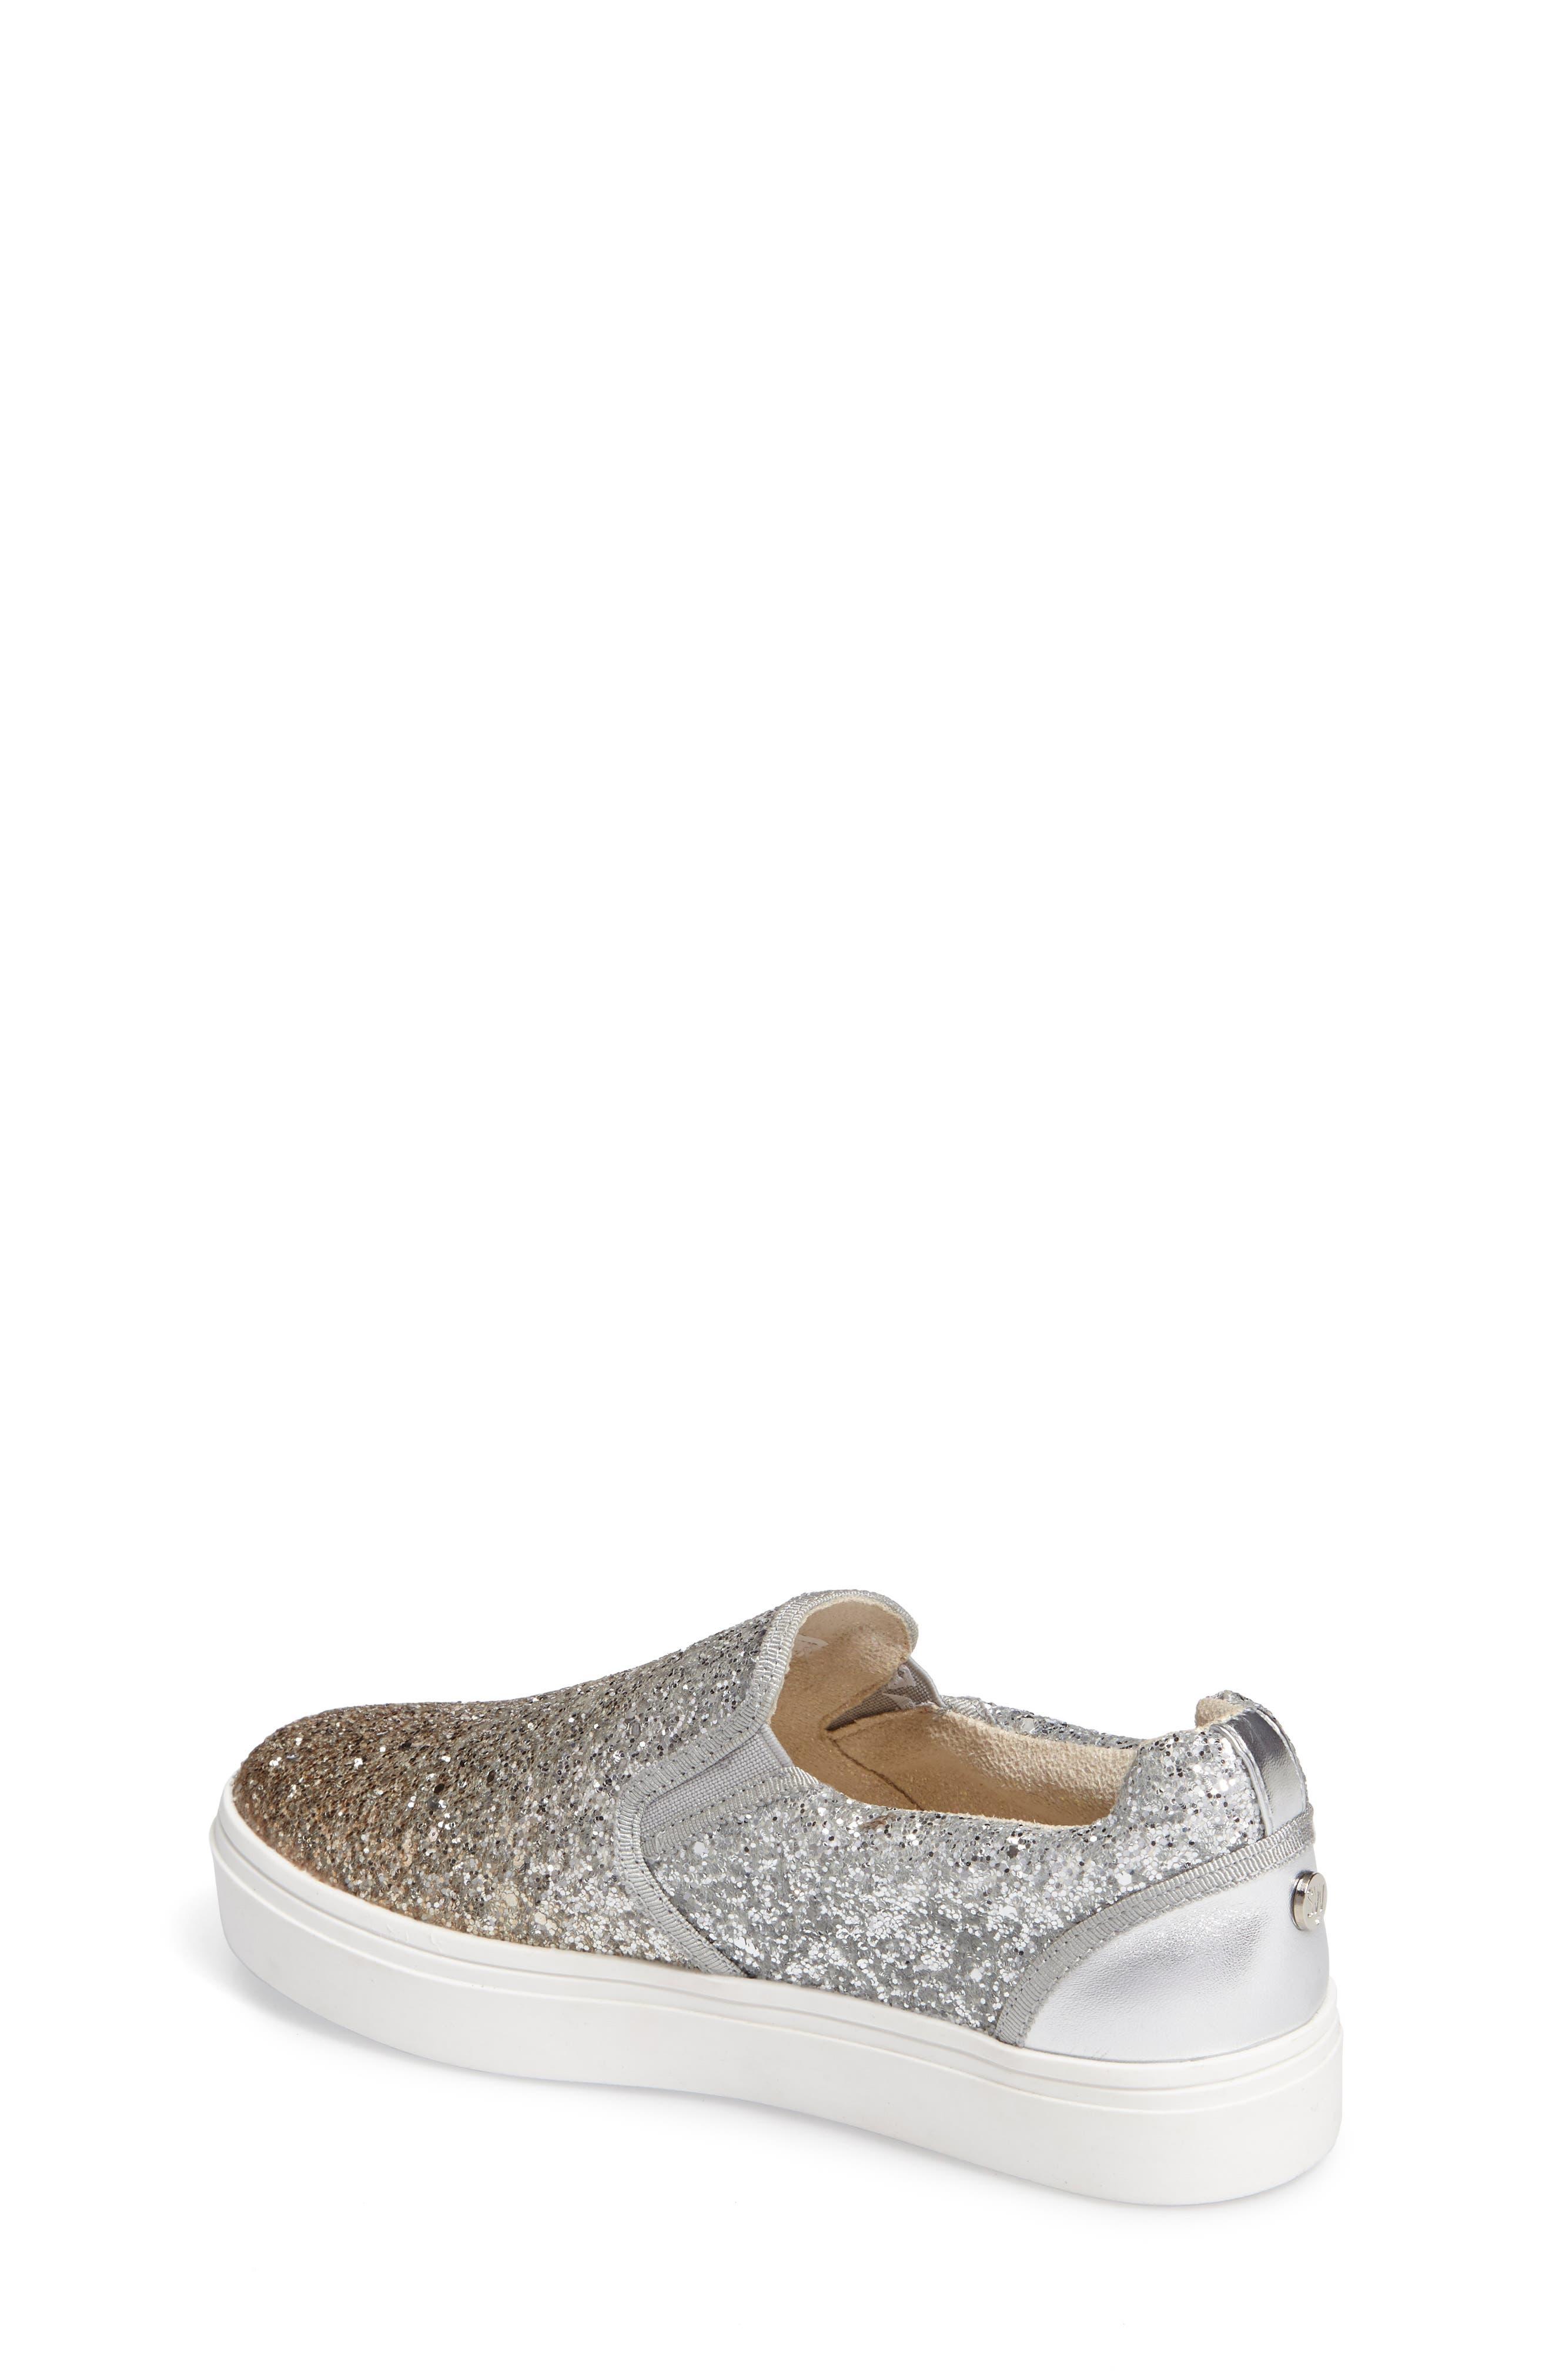 Double Marcia Glitter Platform Sneaker,                             Alternate thumbnail 2, color,                             040